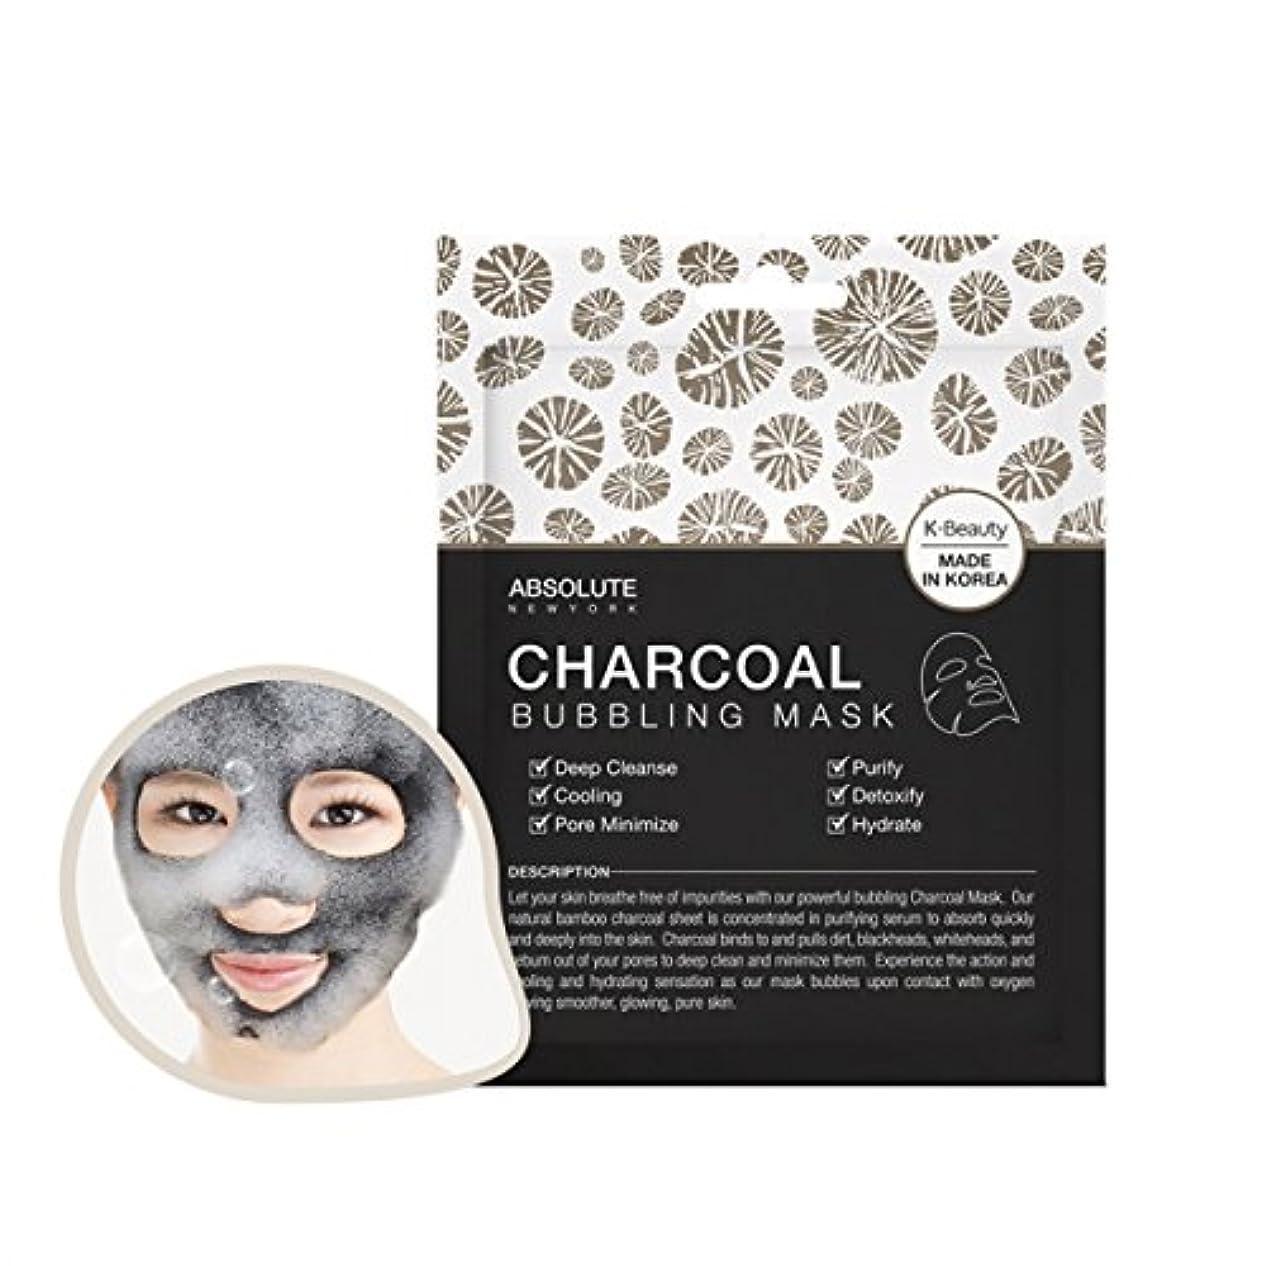 化学薬品回答無限大(3 Pack) ABSOLUTE Charcoal Bubbling Mask (並行輸入品)